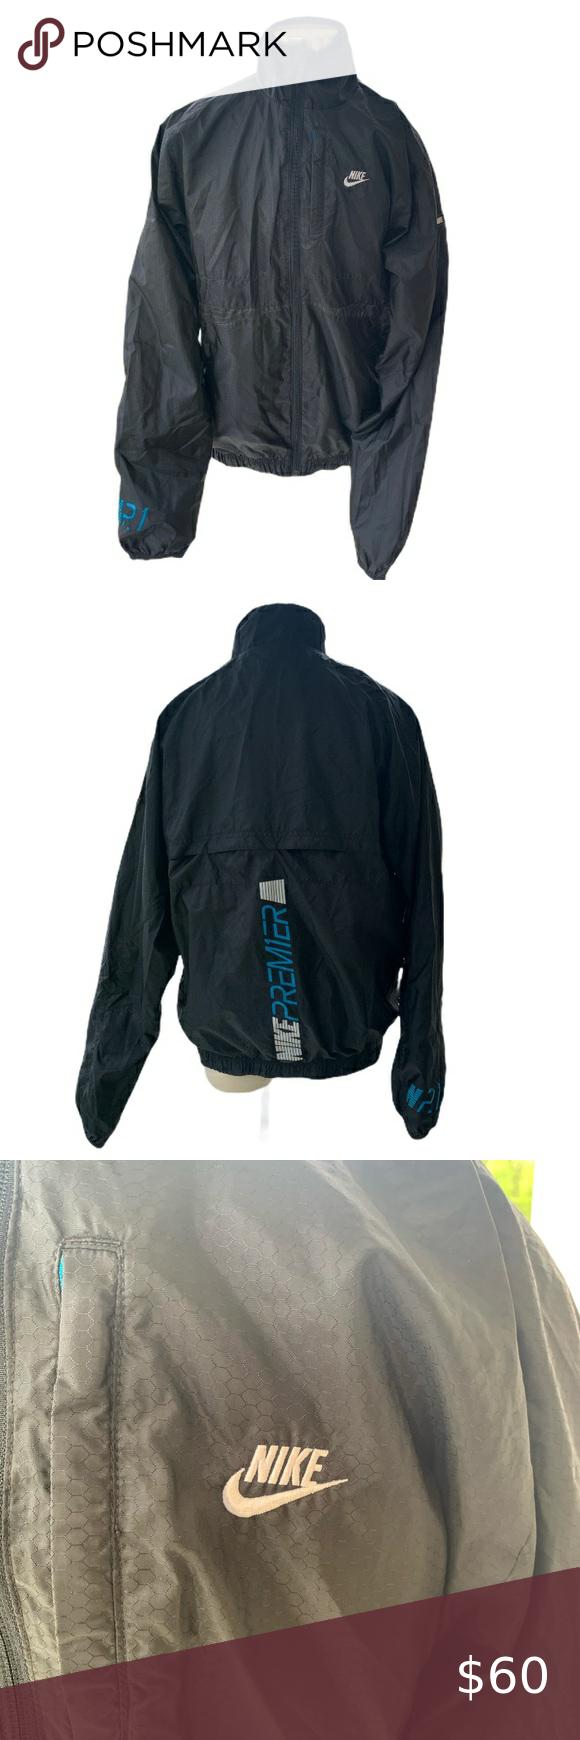 Nike Premiere Jacket In 2020 Jackets Vintage Nike Black Jacket